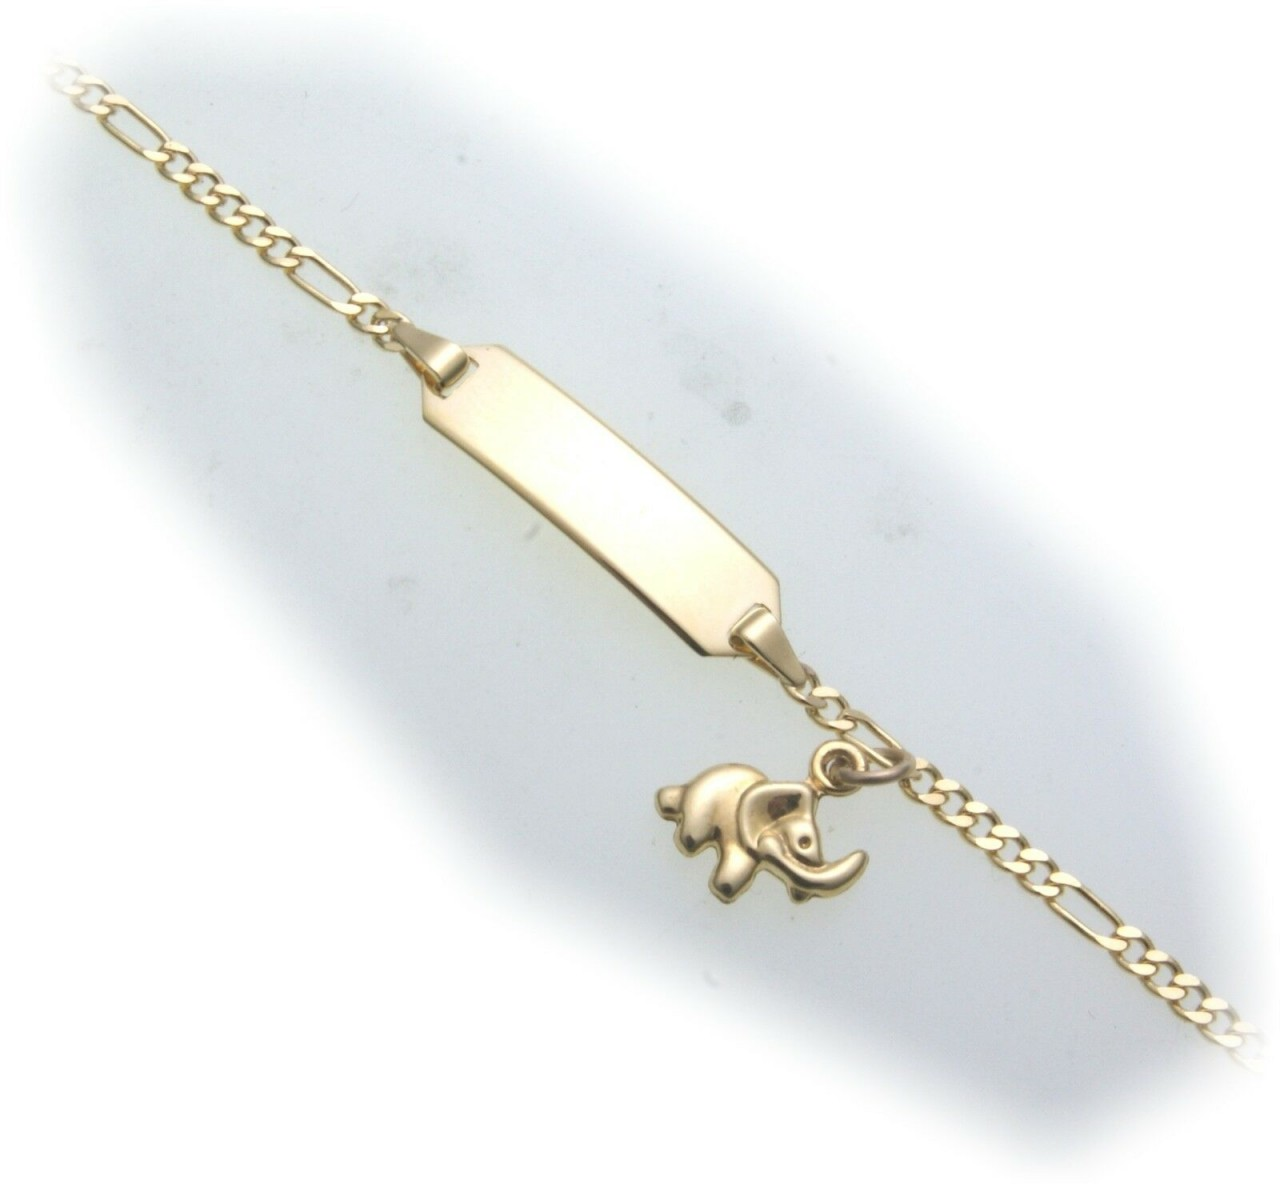 Armband Kinder Elefant 14cm Gold 585 Gelbgold Schildarmband incl. Gravur ID Band